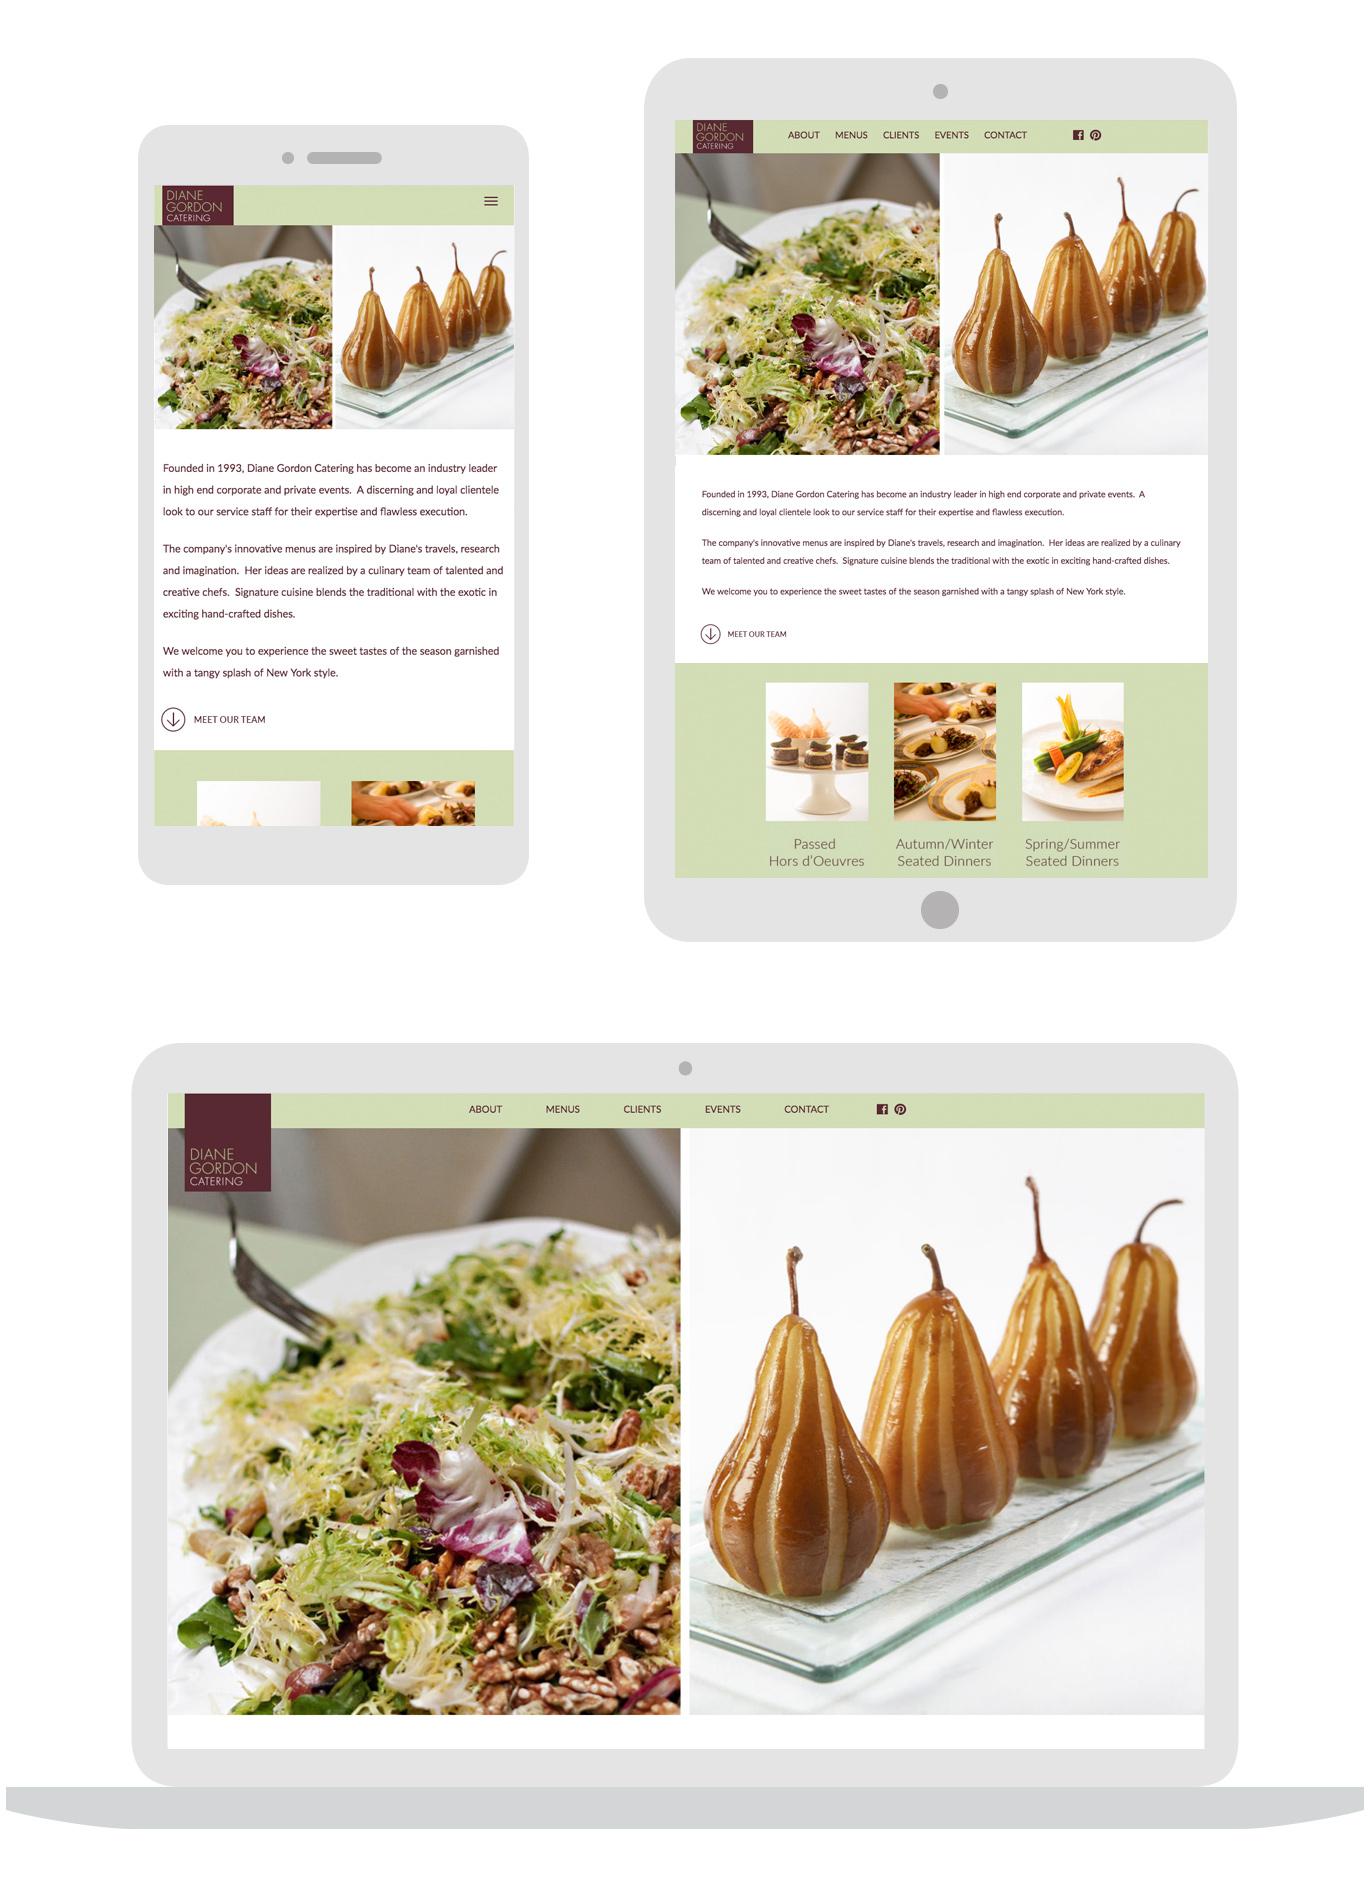 diane-gordon-catering-responsive-web-design_01.jpg